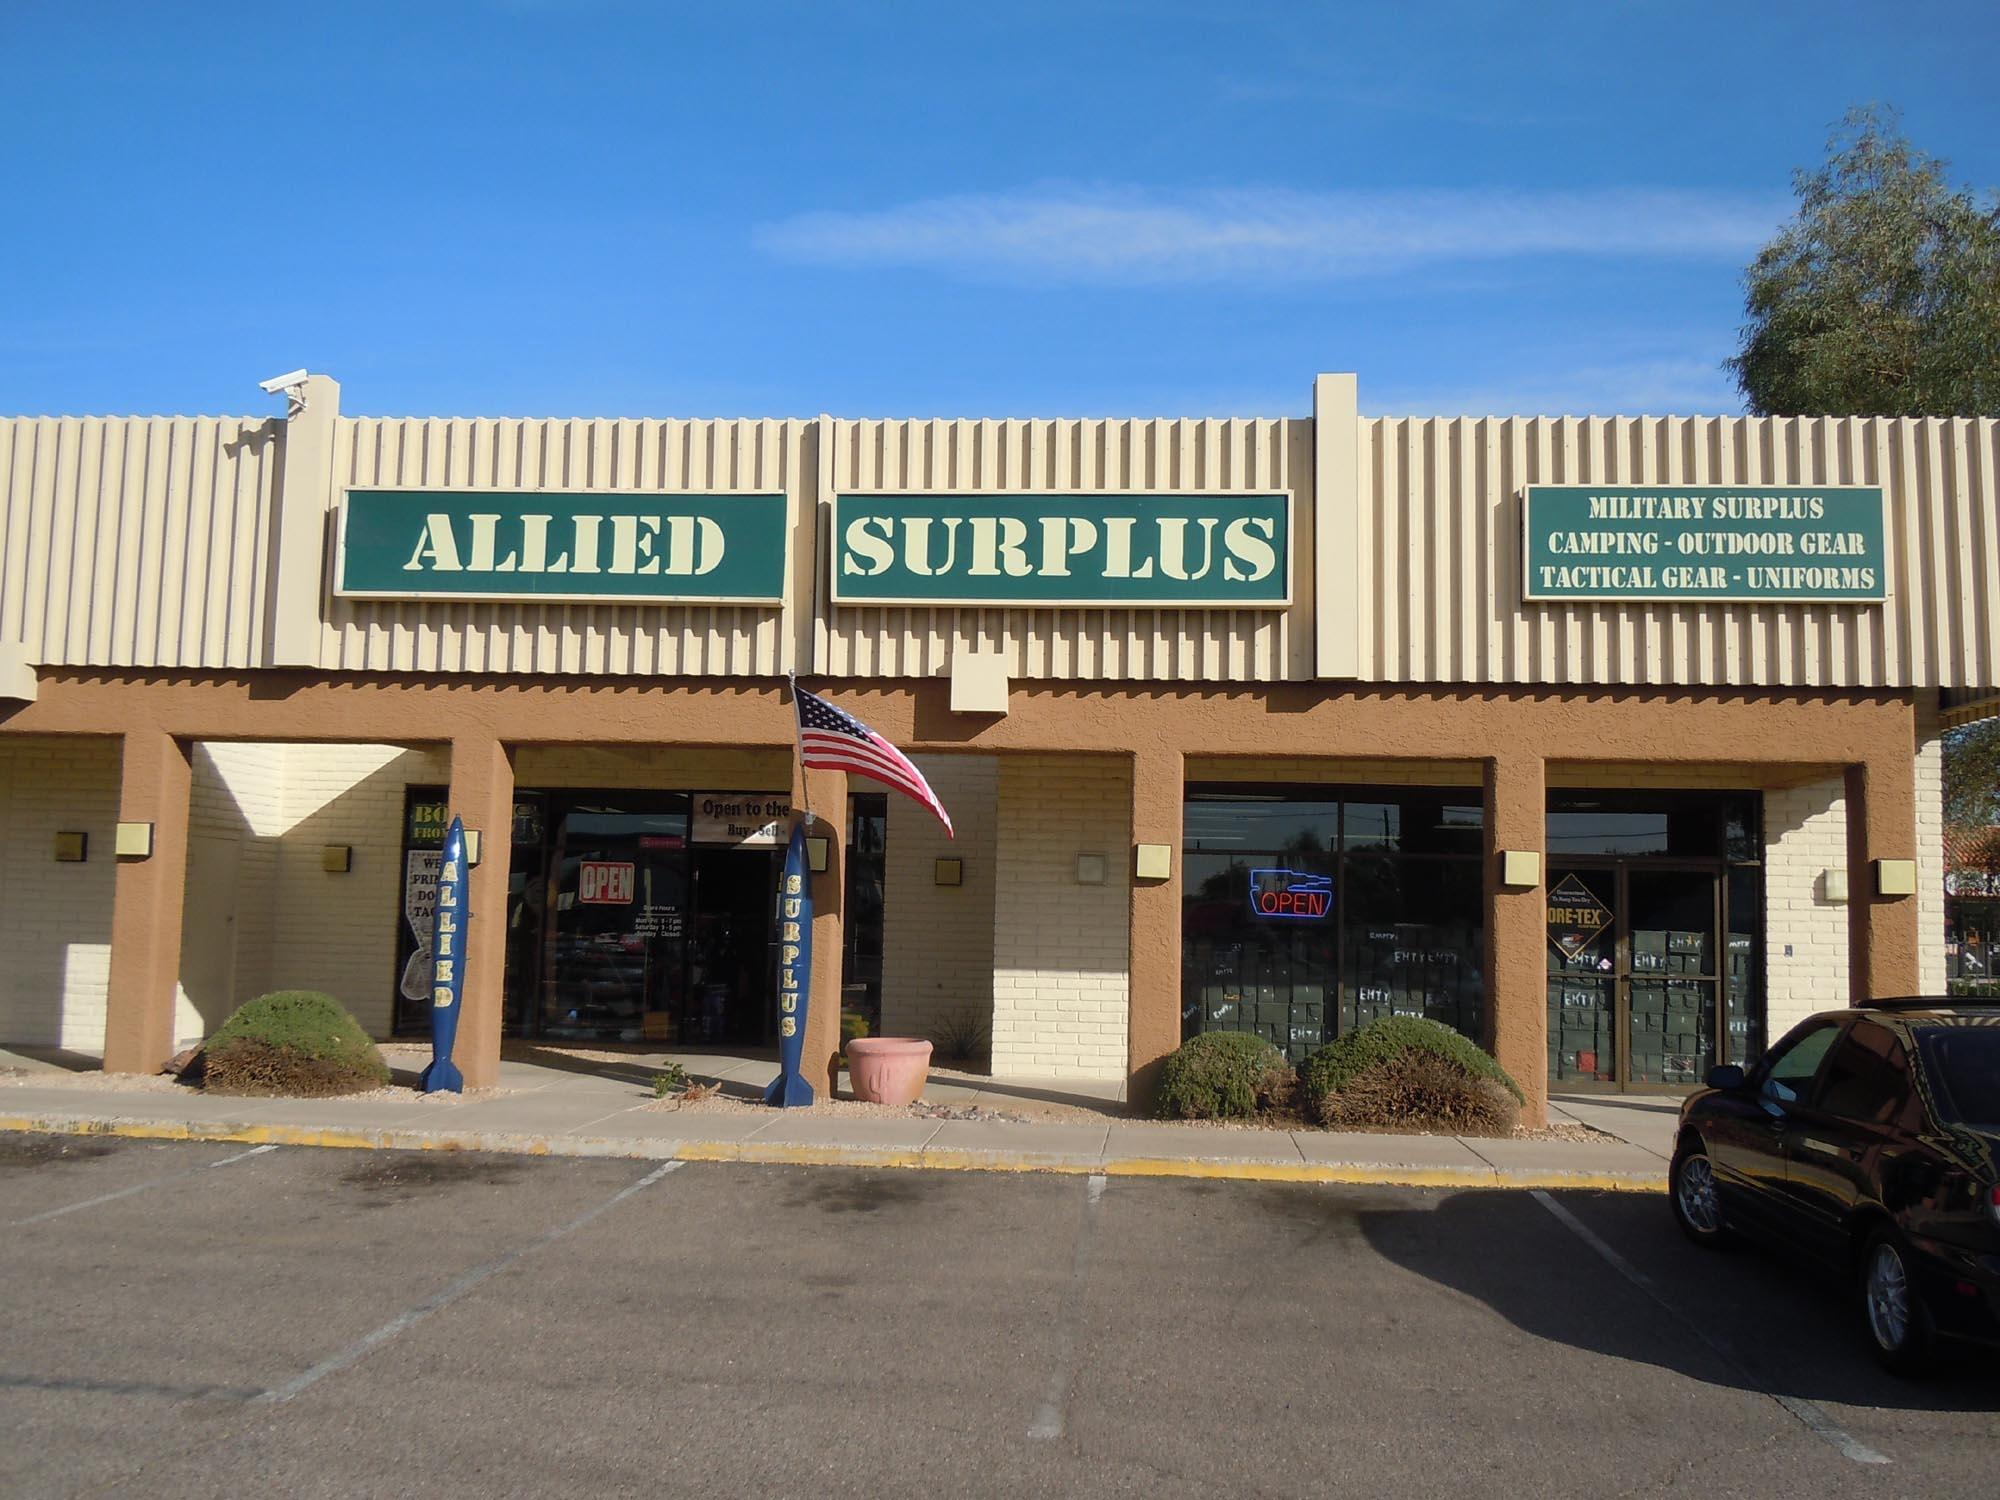 Allied Surplus 12450 N 35th Ave, Phoenix, AZ 85029 - YP.com